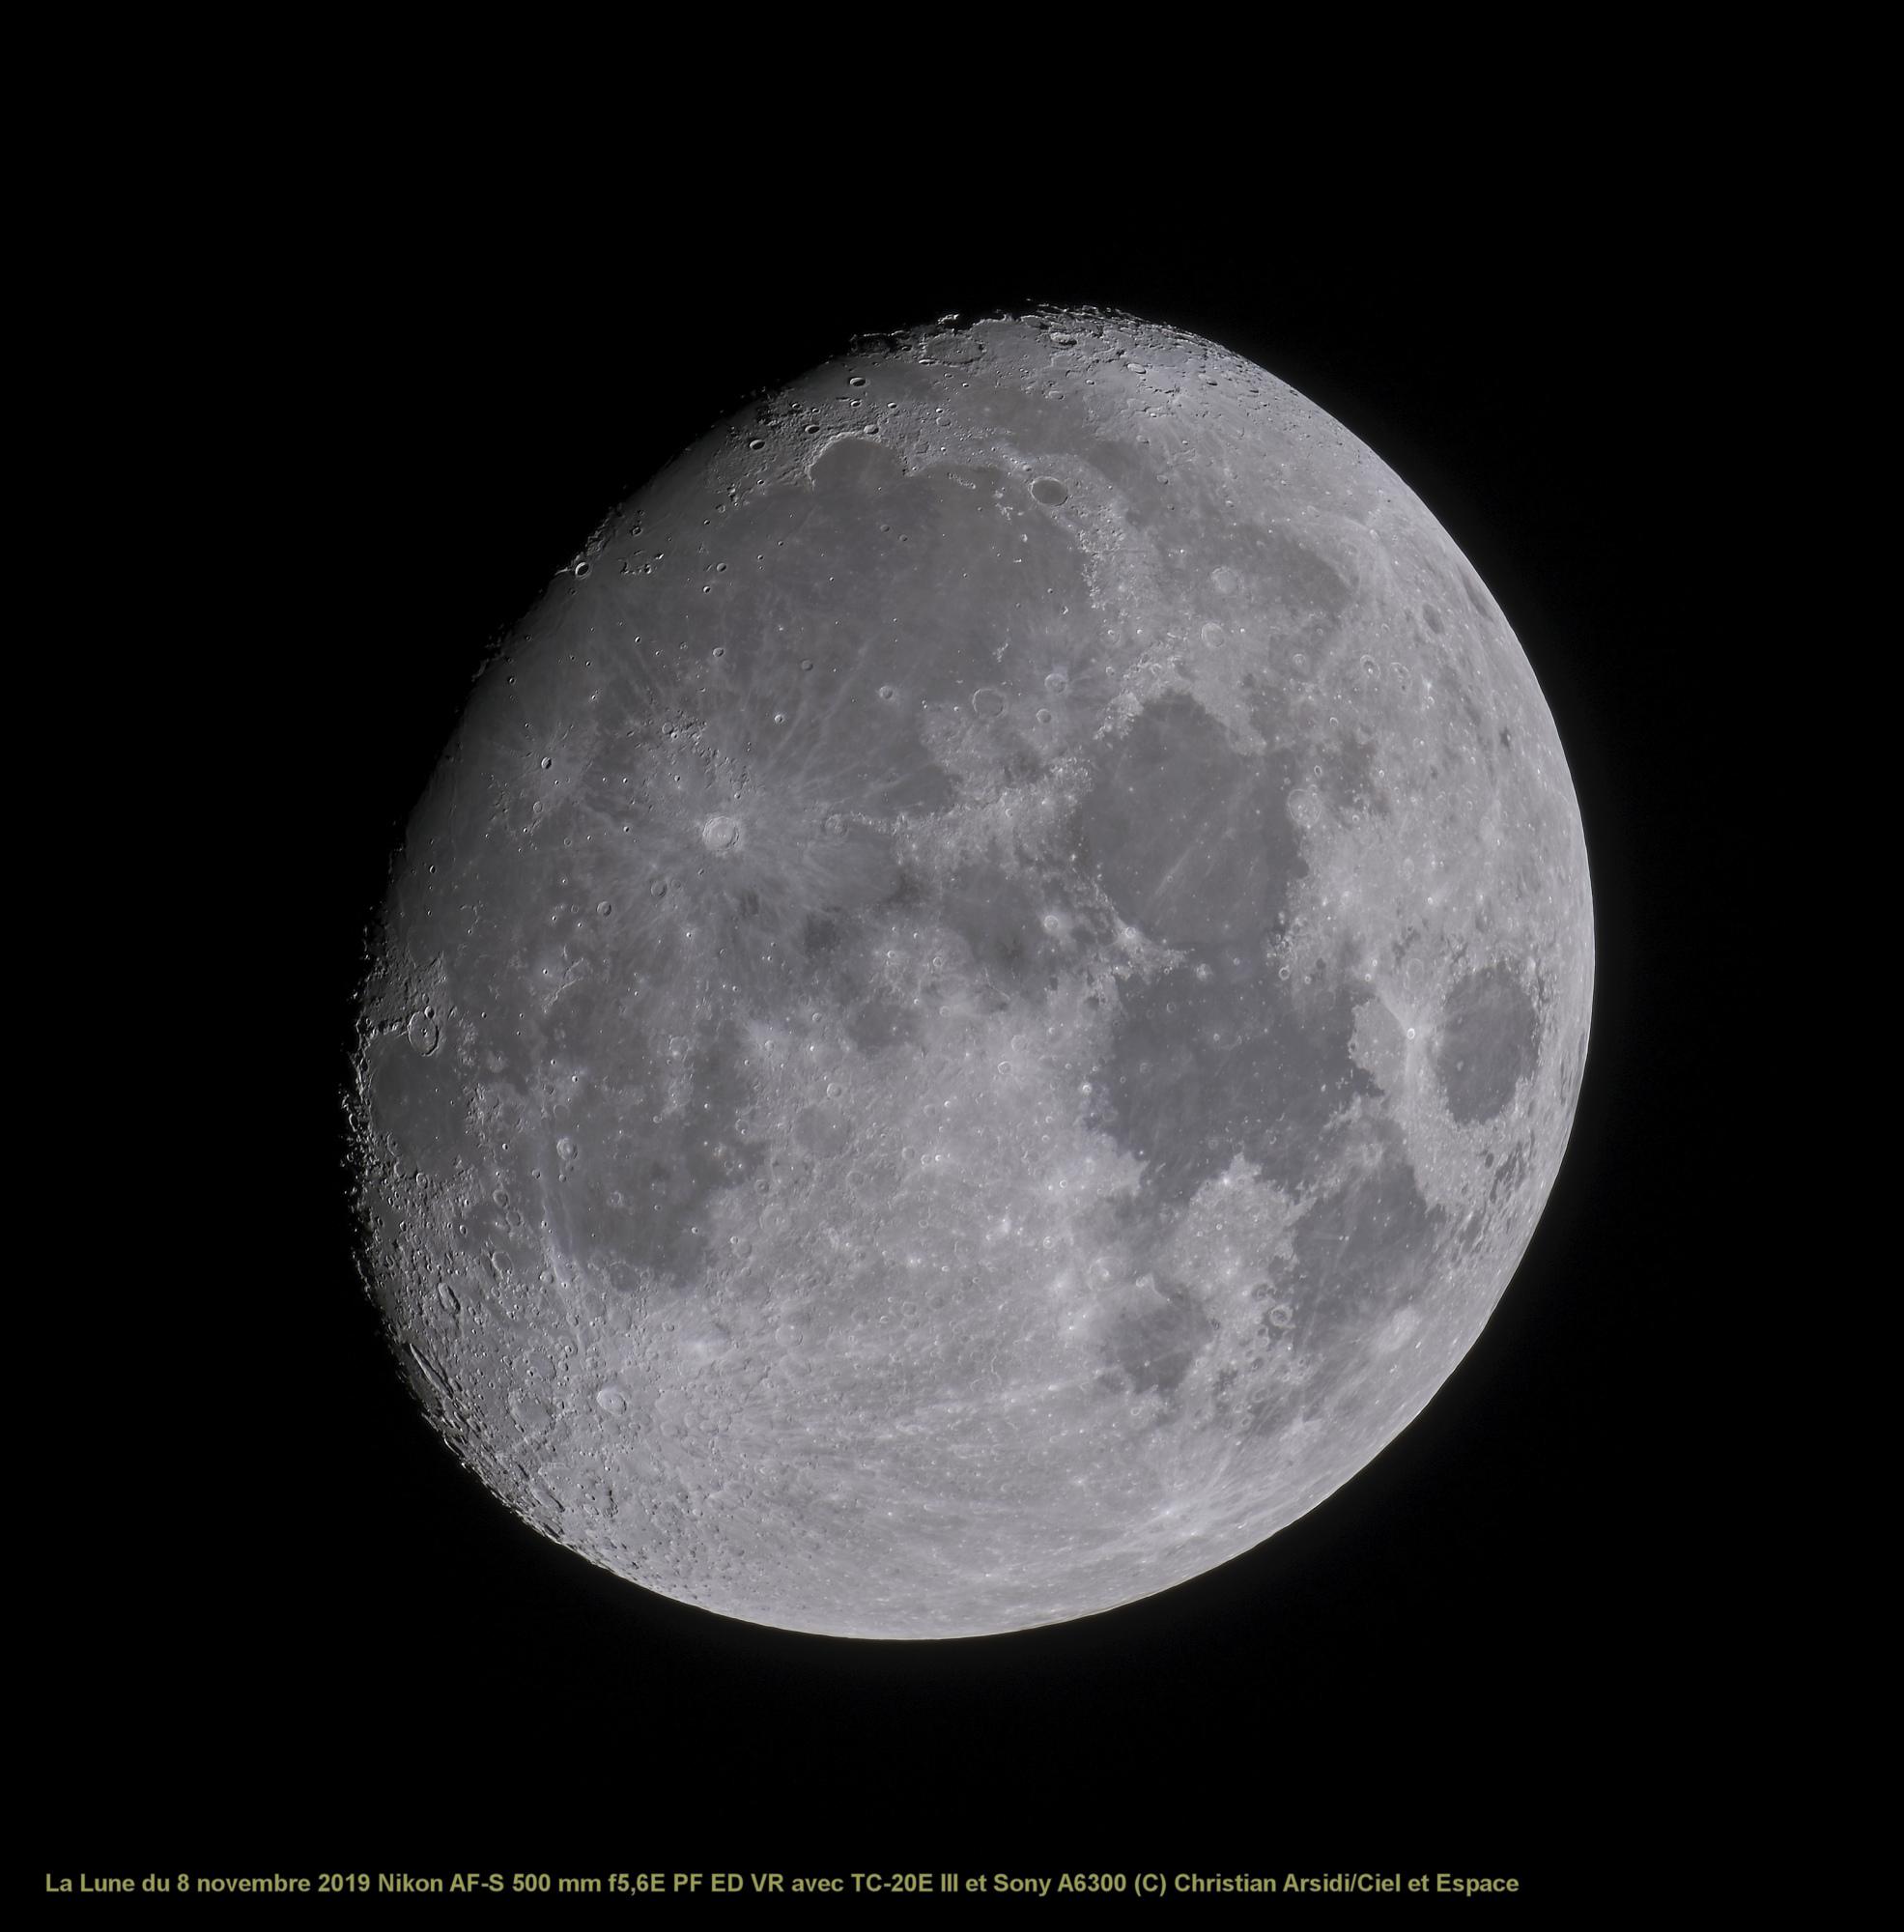 La Lune 35 images V2 traitée_DxO-1 1 BV JPEG TTB.jpg